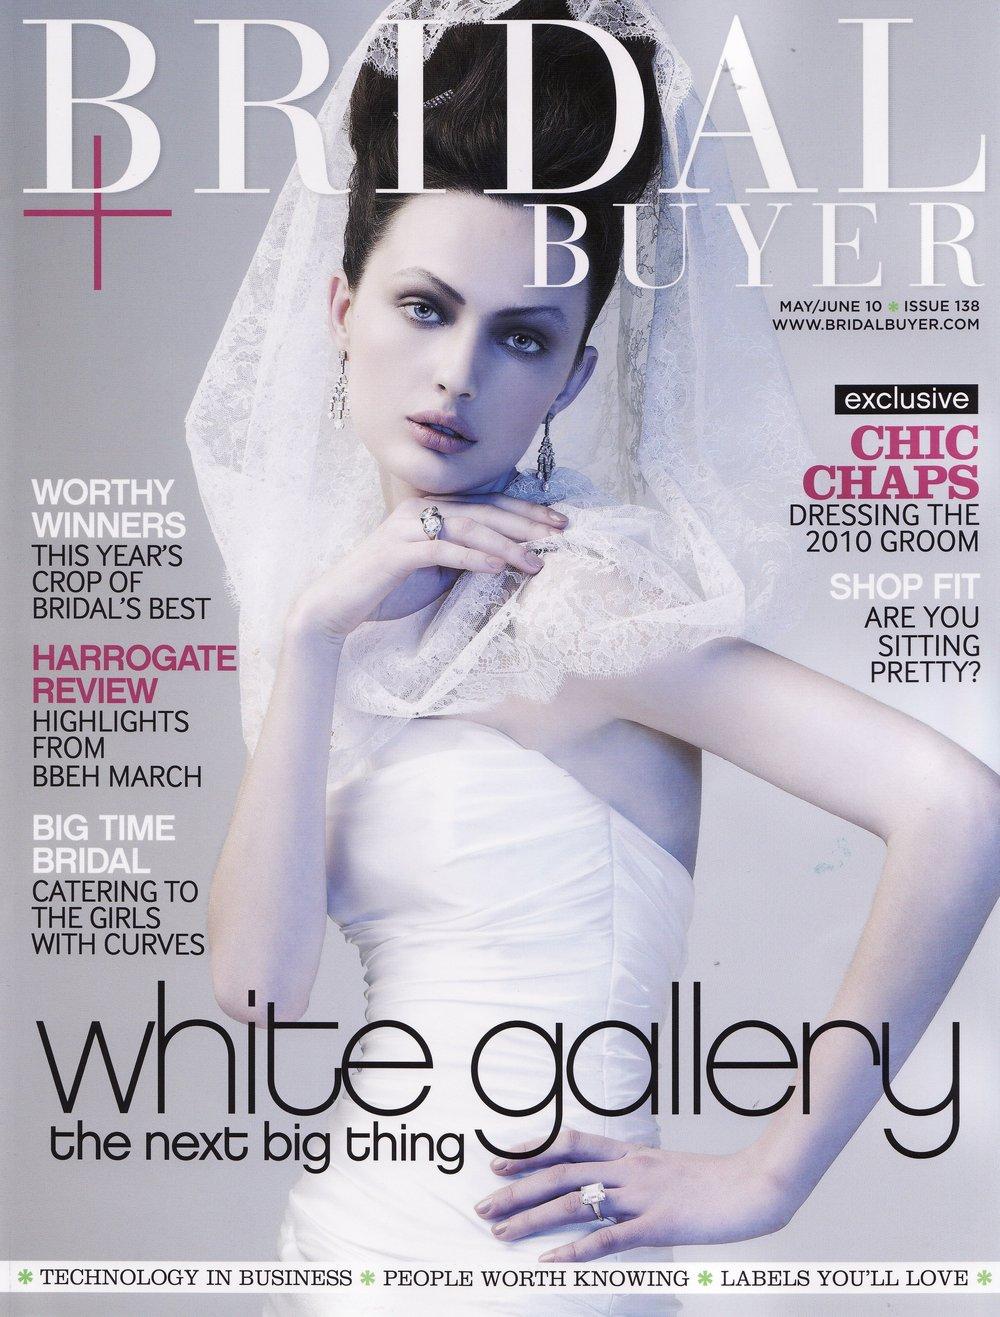 bridal buyer cover may 2010.jpg